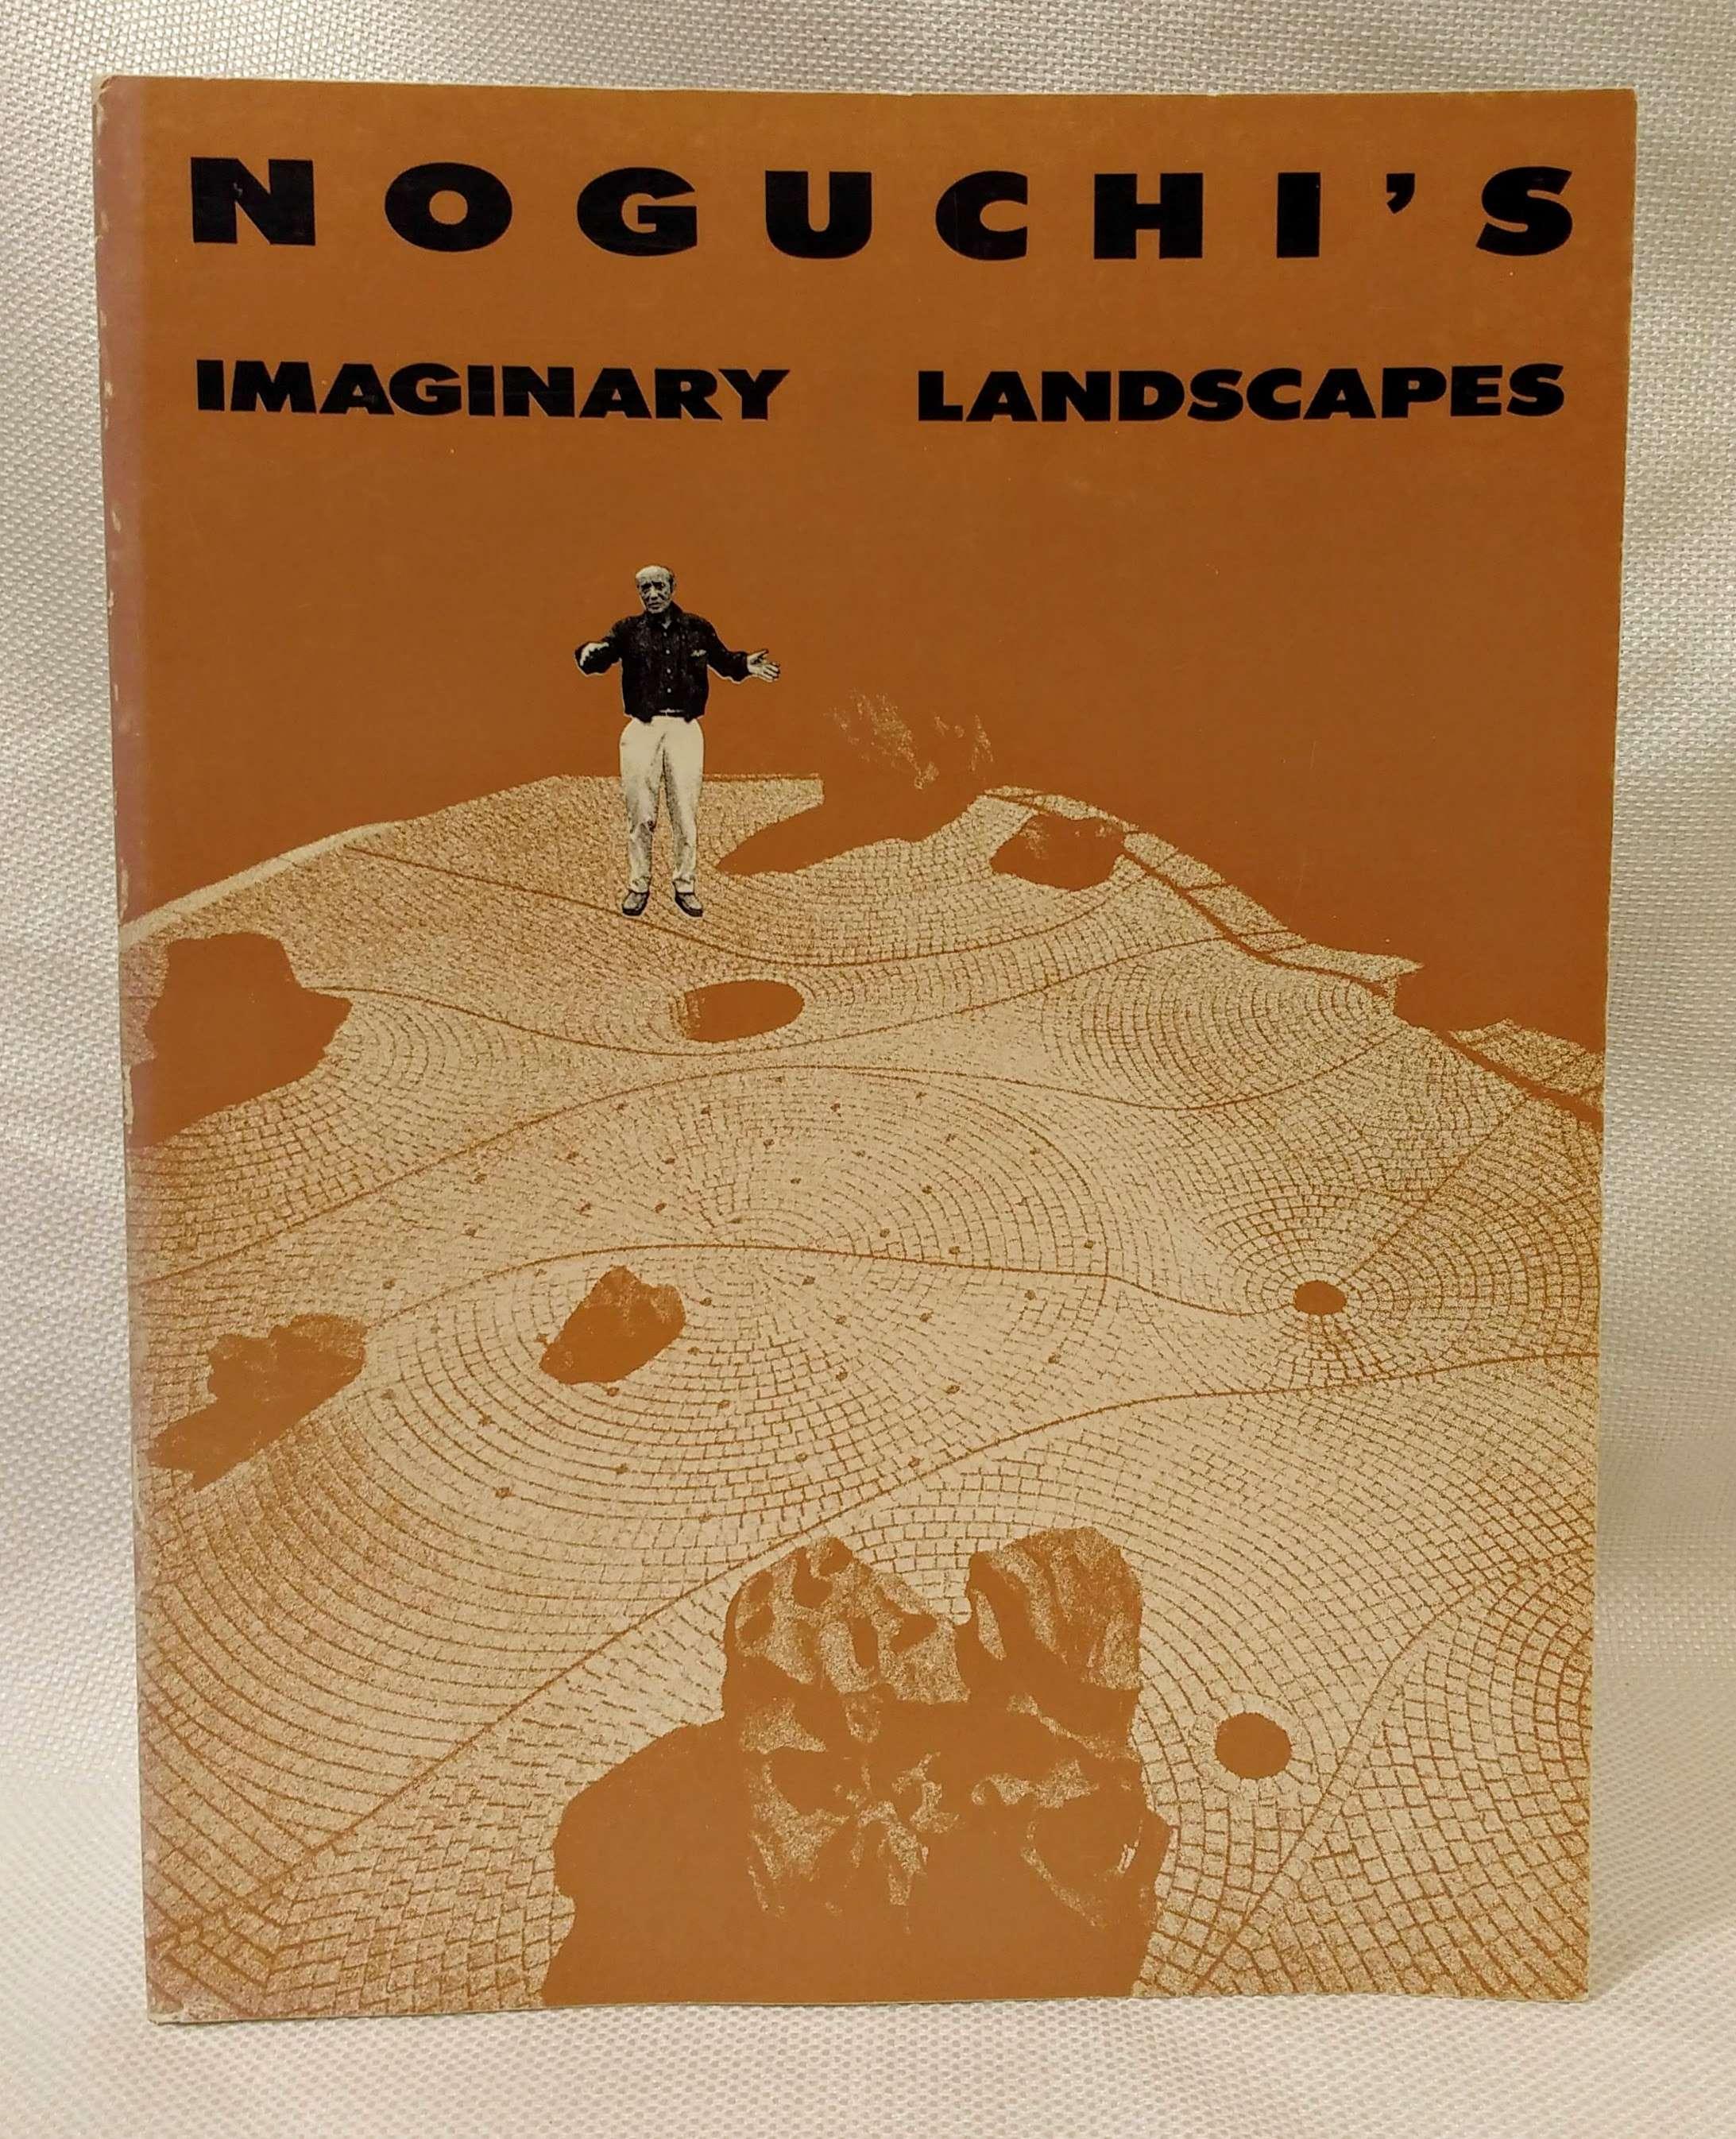 Noguchi's Imaginary Landscapes [An Exhibition Organized by Walker Art Center], Friedman, Martin L.; Noguchi, Isamu